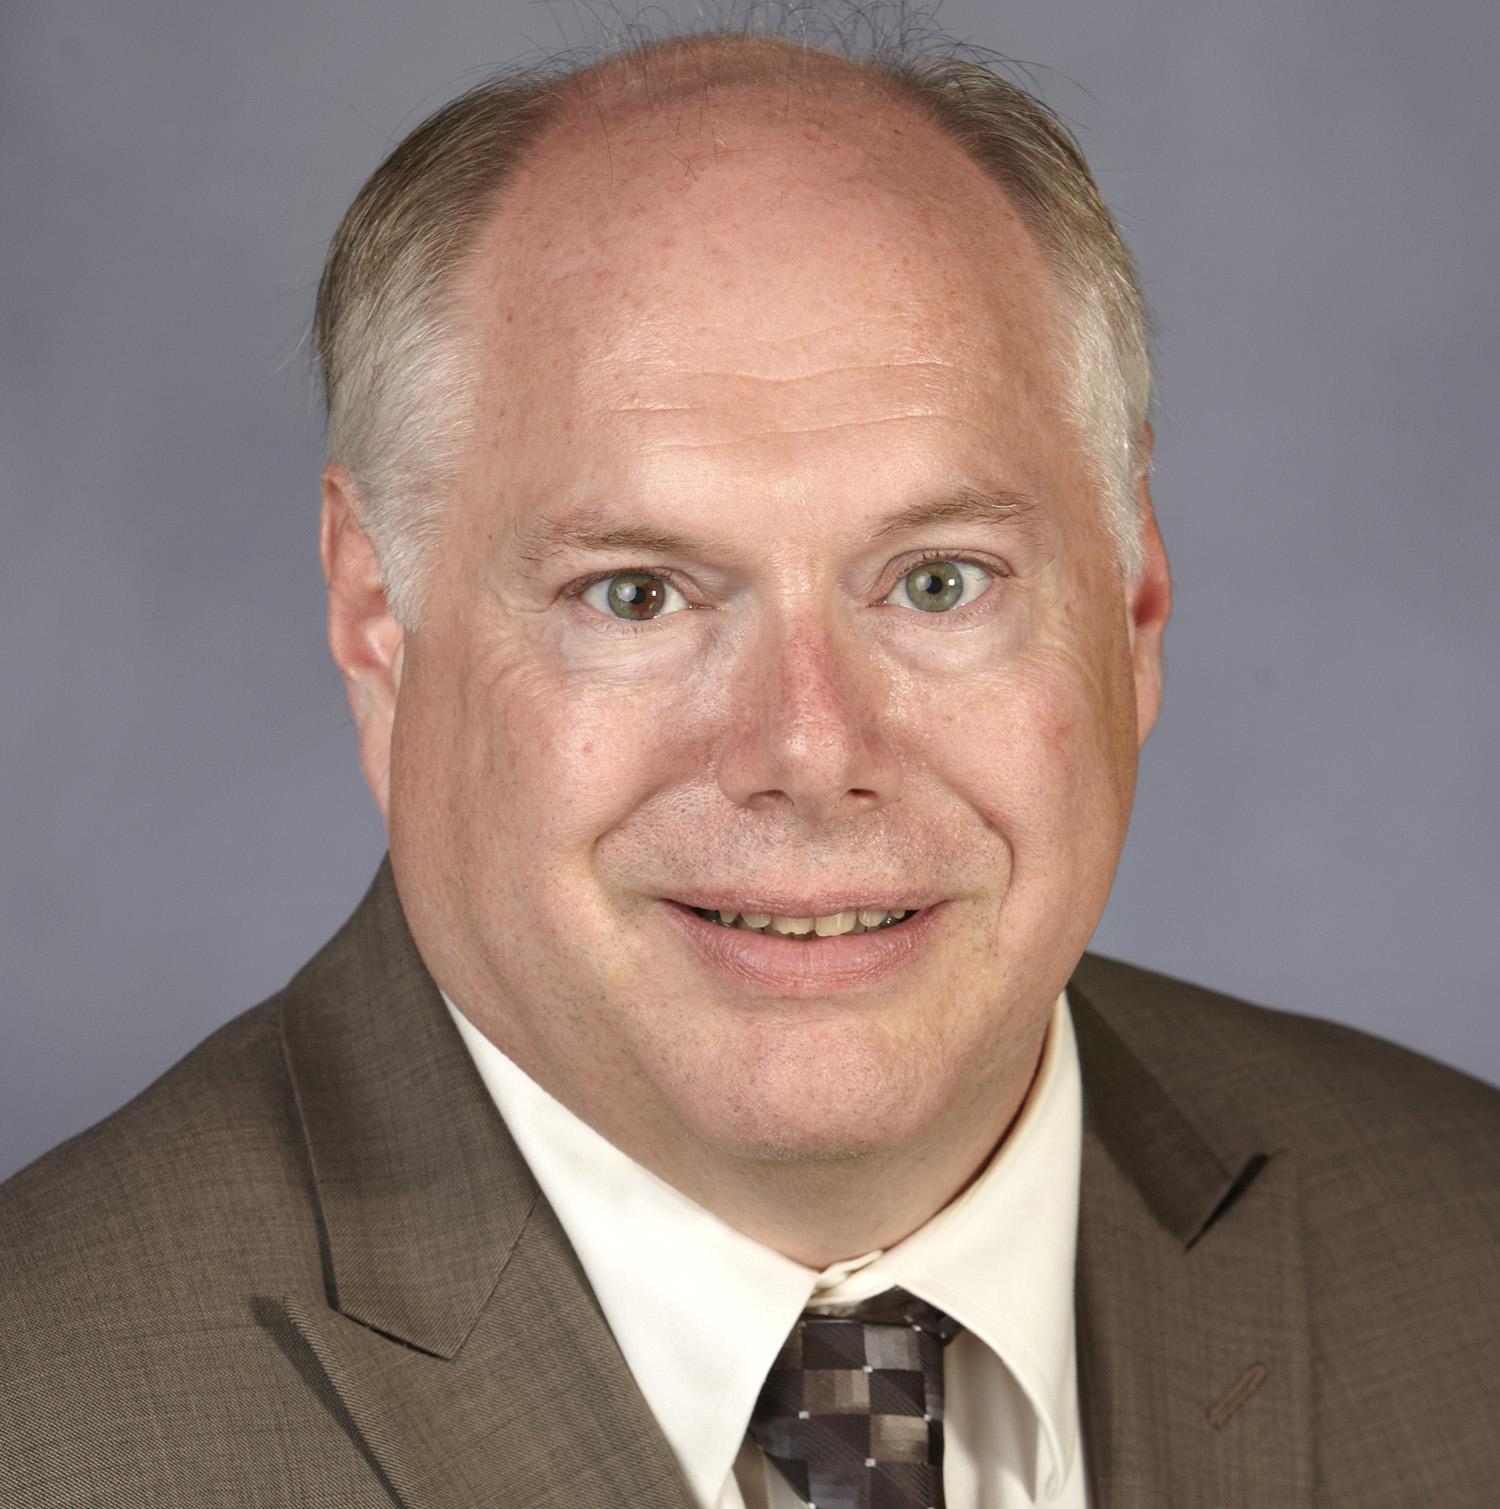 Carl Reiber, PhD